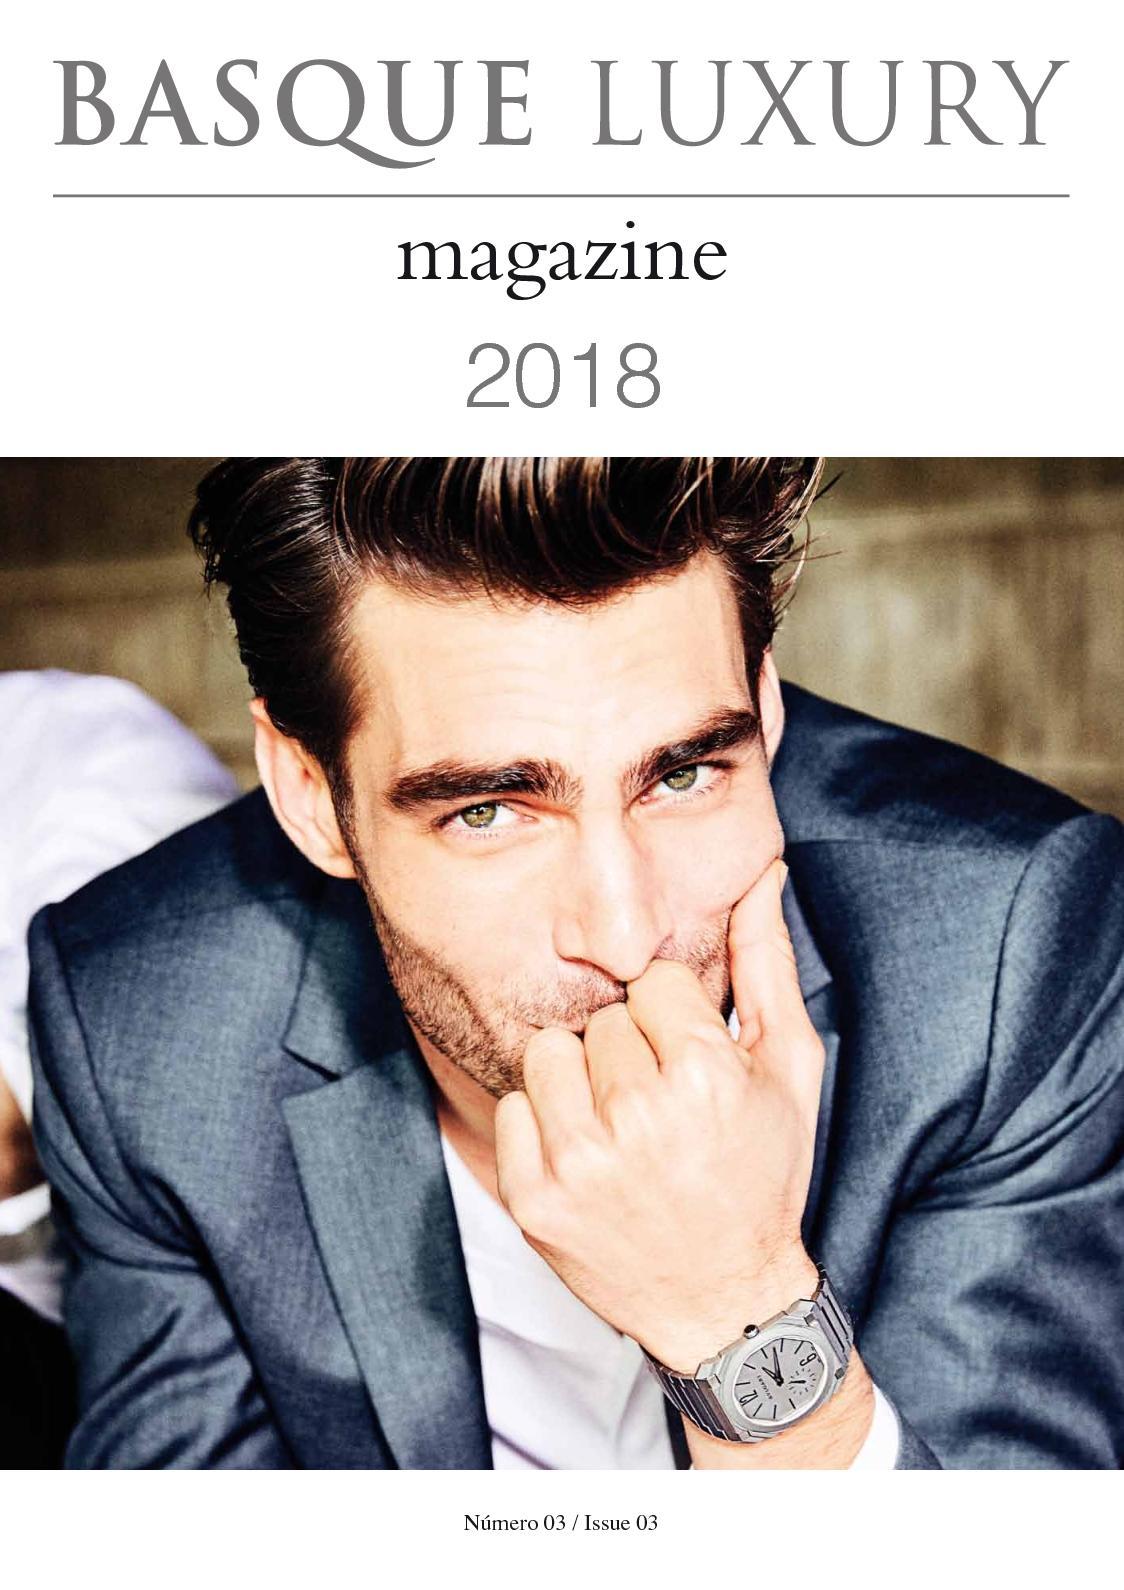 98a06d546f Calaméo - Basque Luxury Magazine 2018